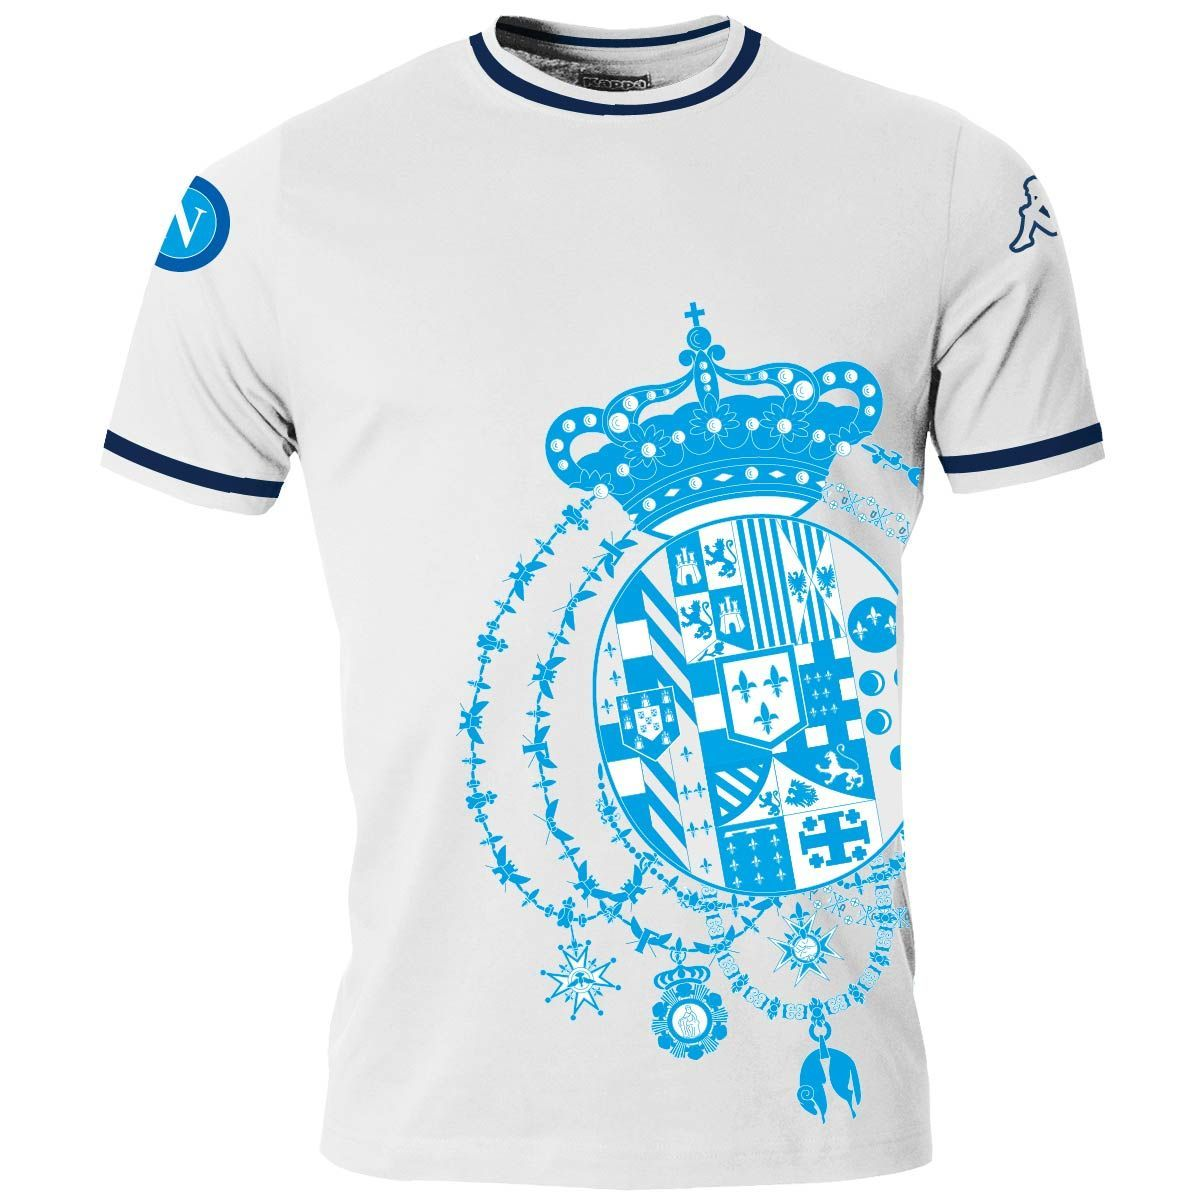 La t-shirt borbonica del Napoli: l'ultimo atto del De Laurentiis meridionalista che diede del paraculo a Cavour